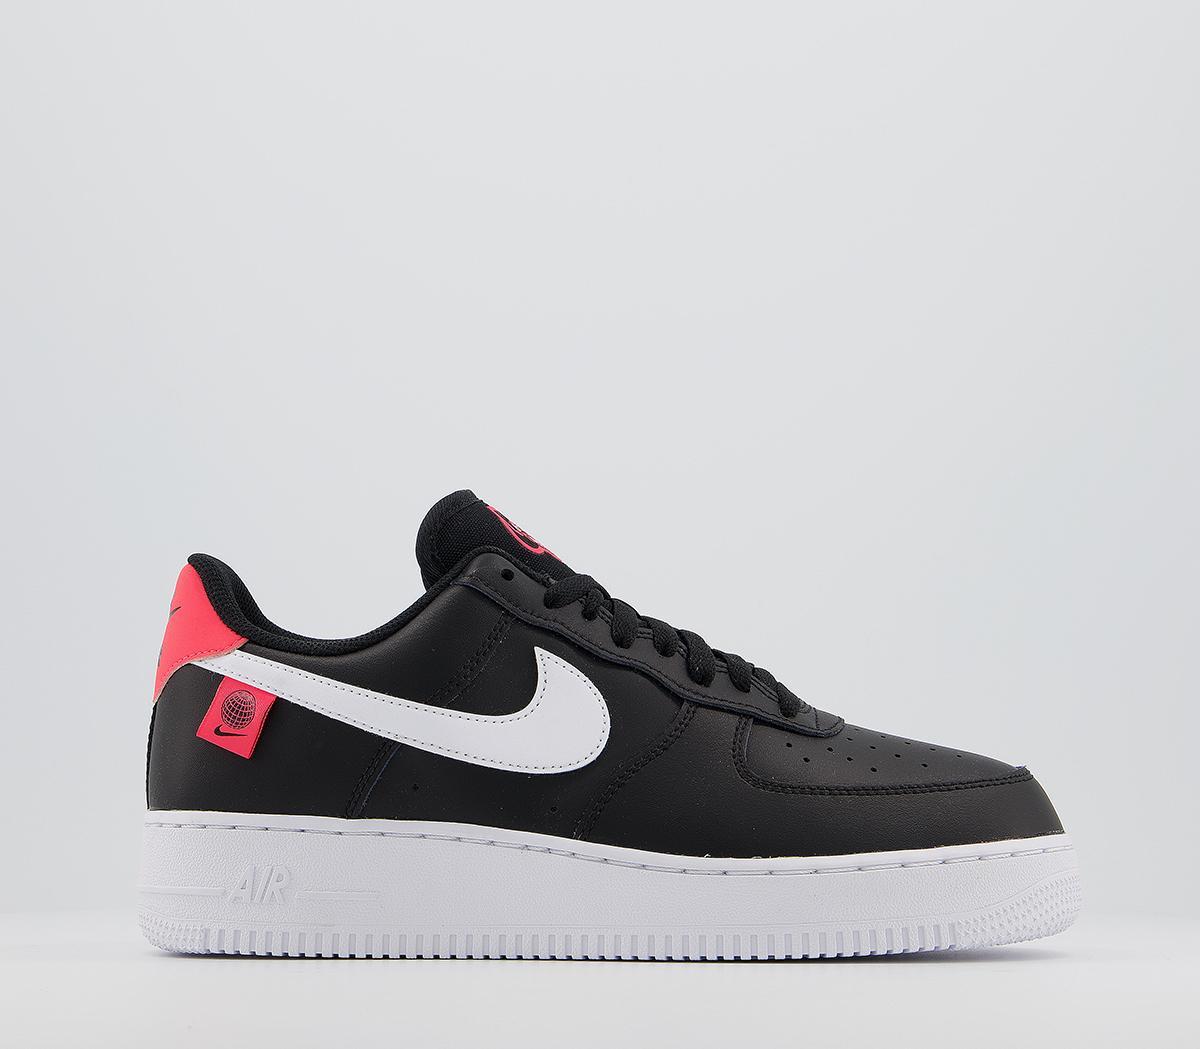 silencio bordado Ministro  Nike Air Force 1 07 Trainers Black White Flash Crimson - His trainers